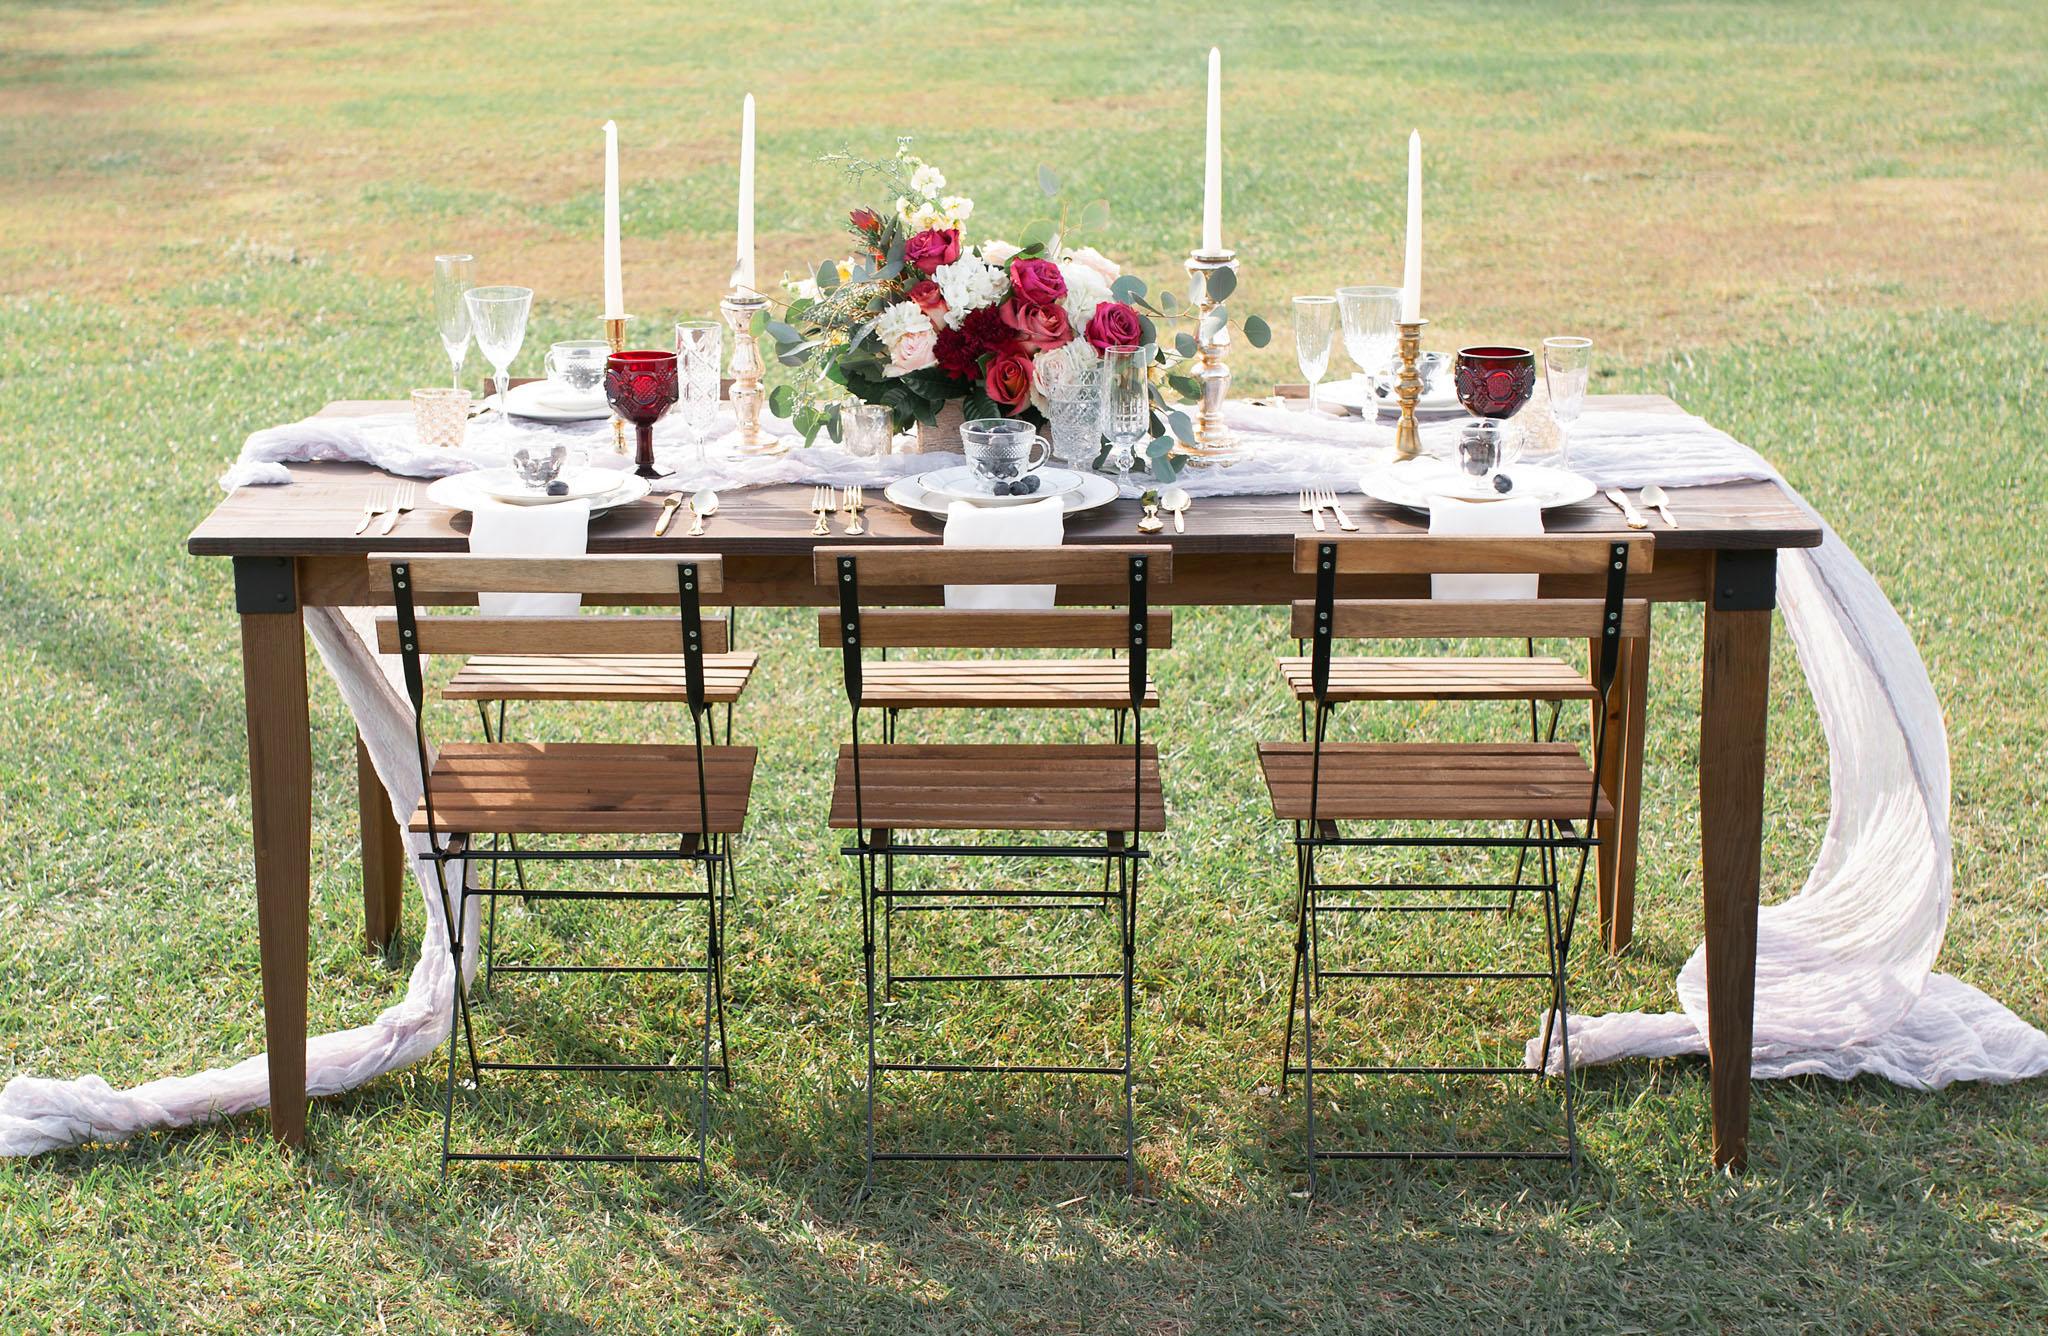 Orlando Tampa Lakeland Farm Table Rentals